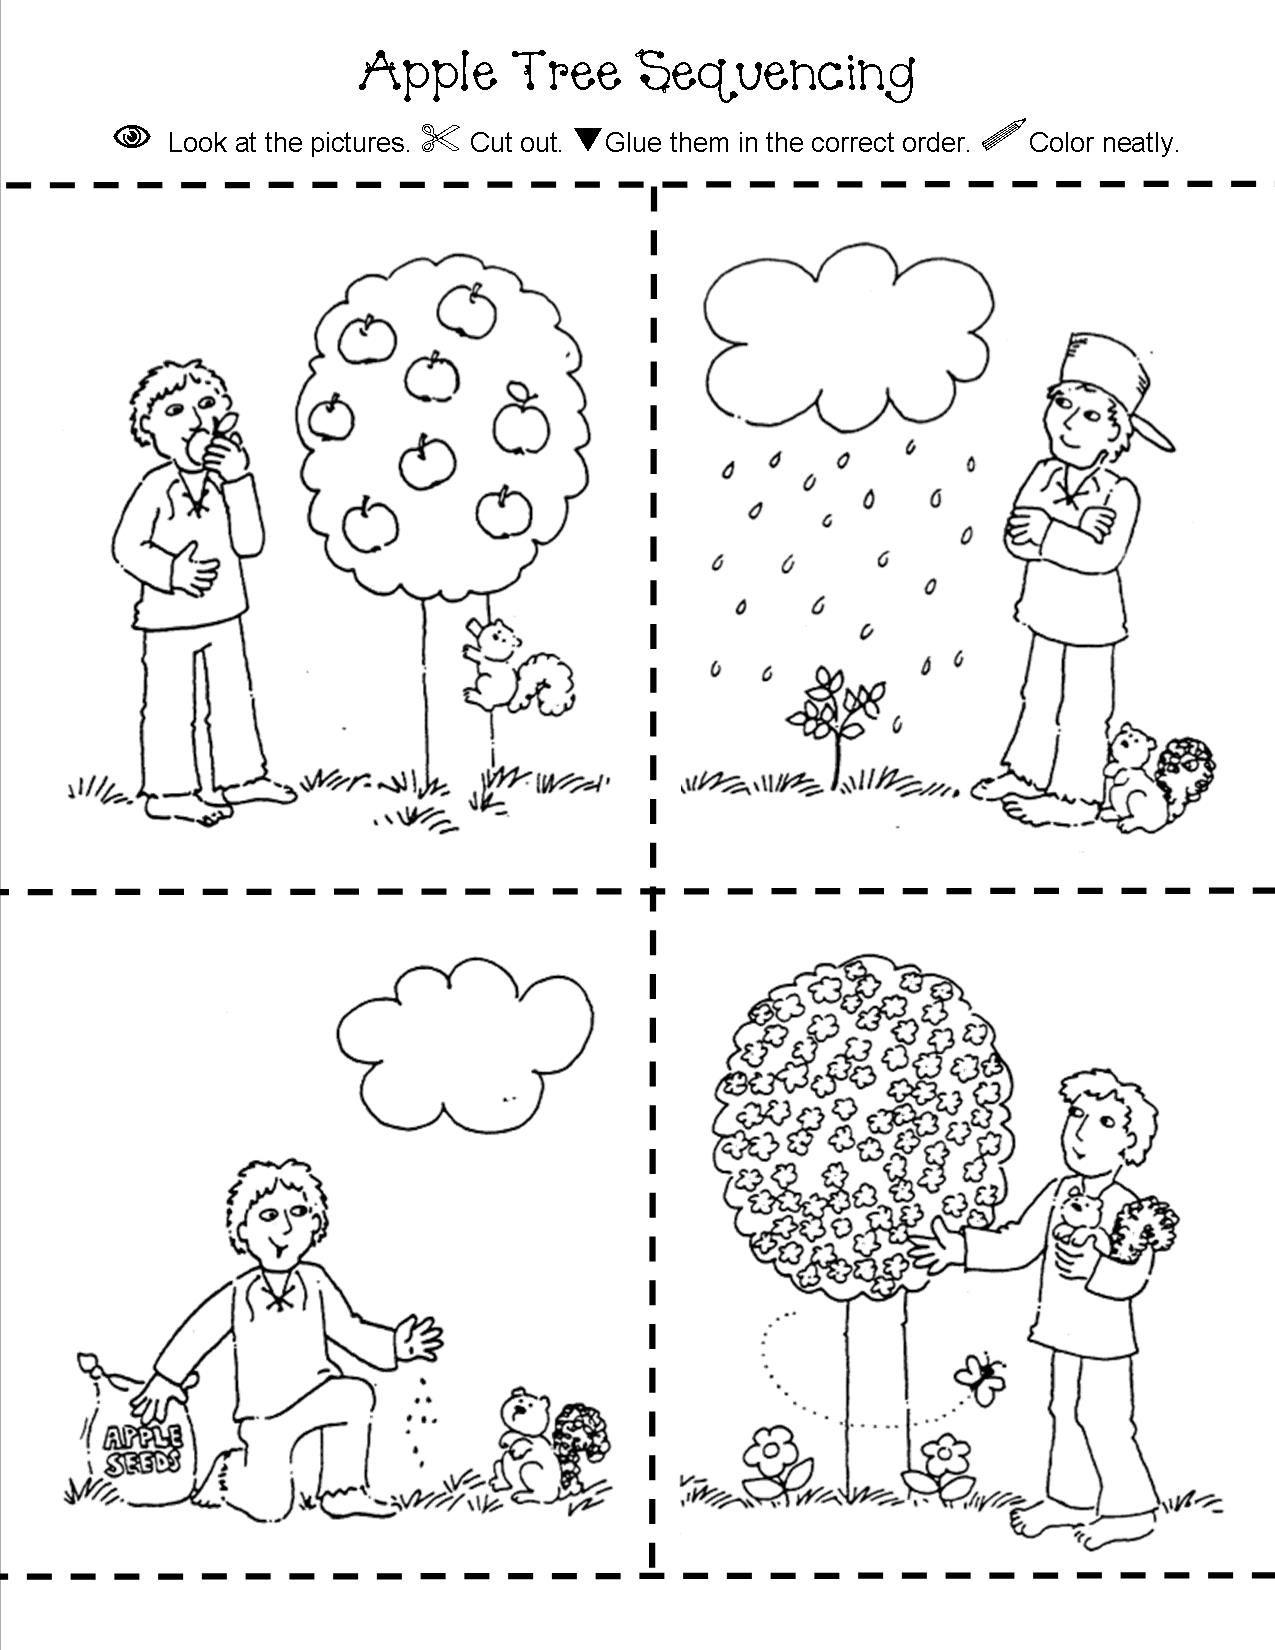 Apple Tree Sequencing Fall Kindergarten Johnny Appleseed Activities Apple Life Cycle [ 1650 x 1275 Pixel ]